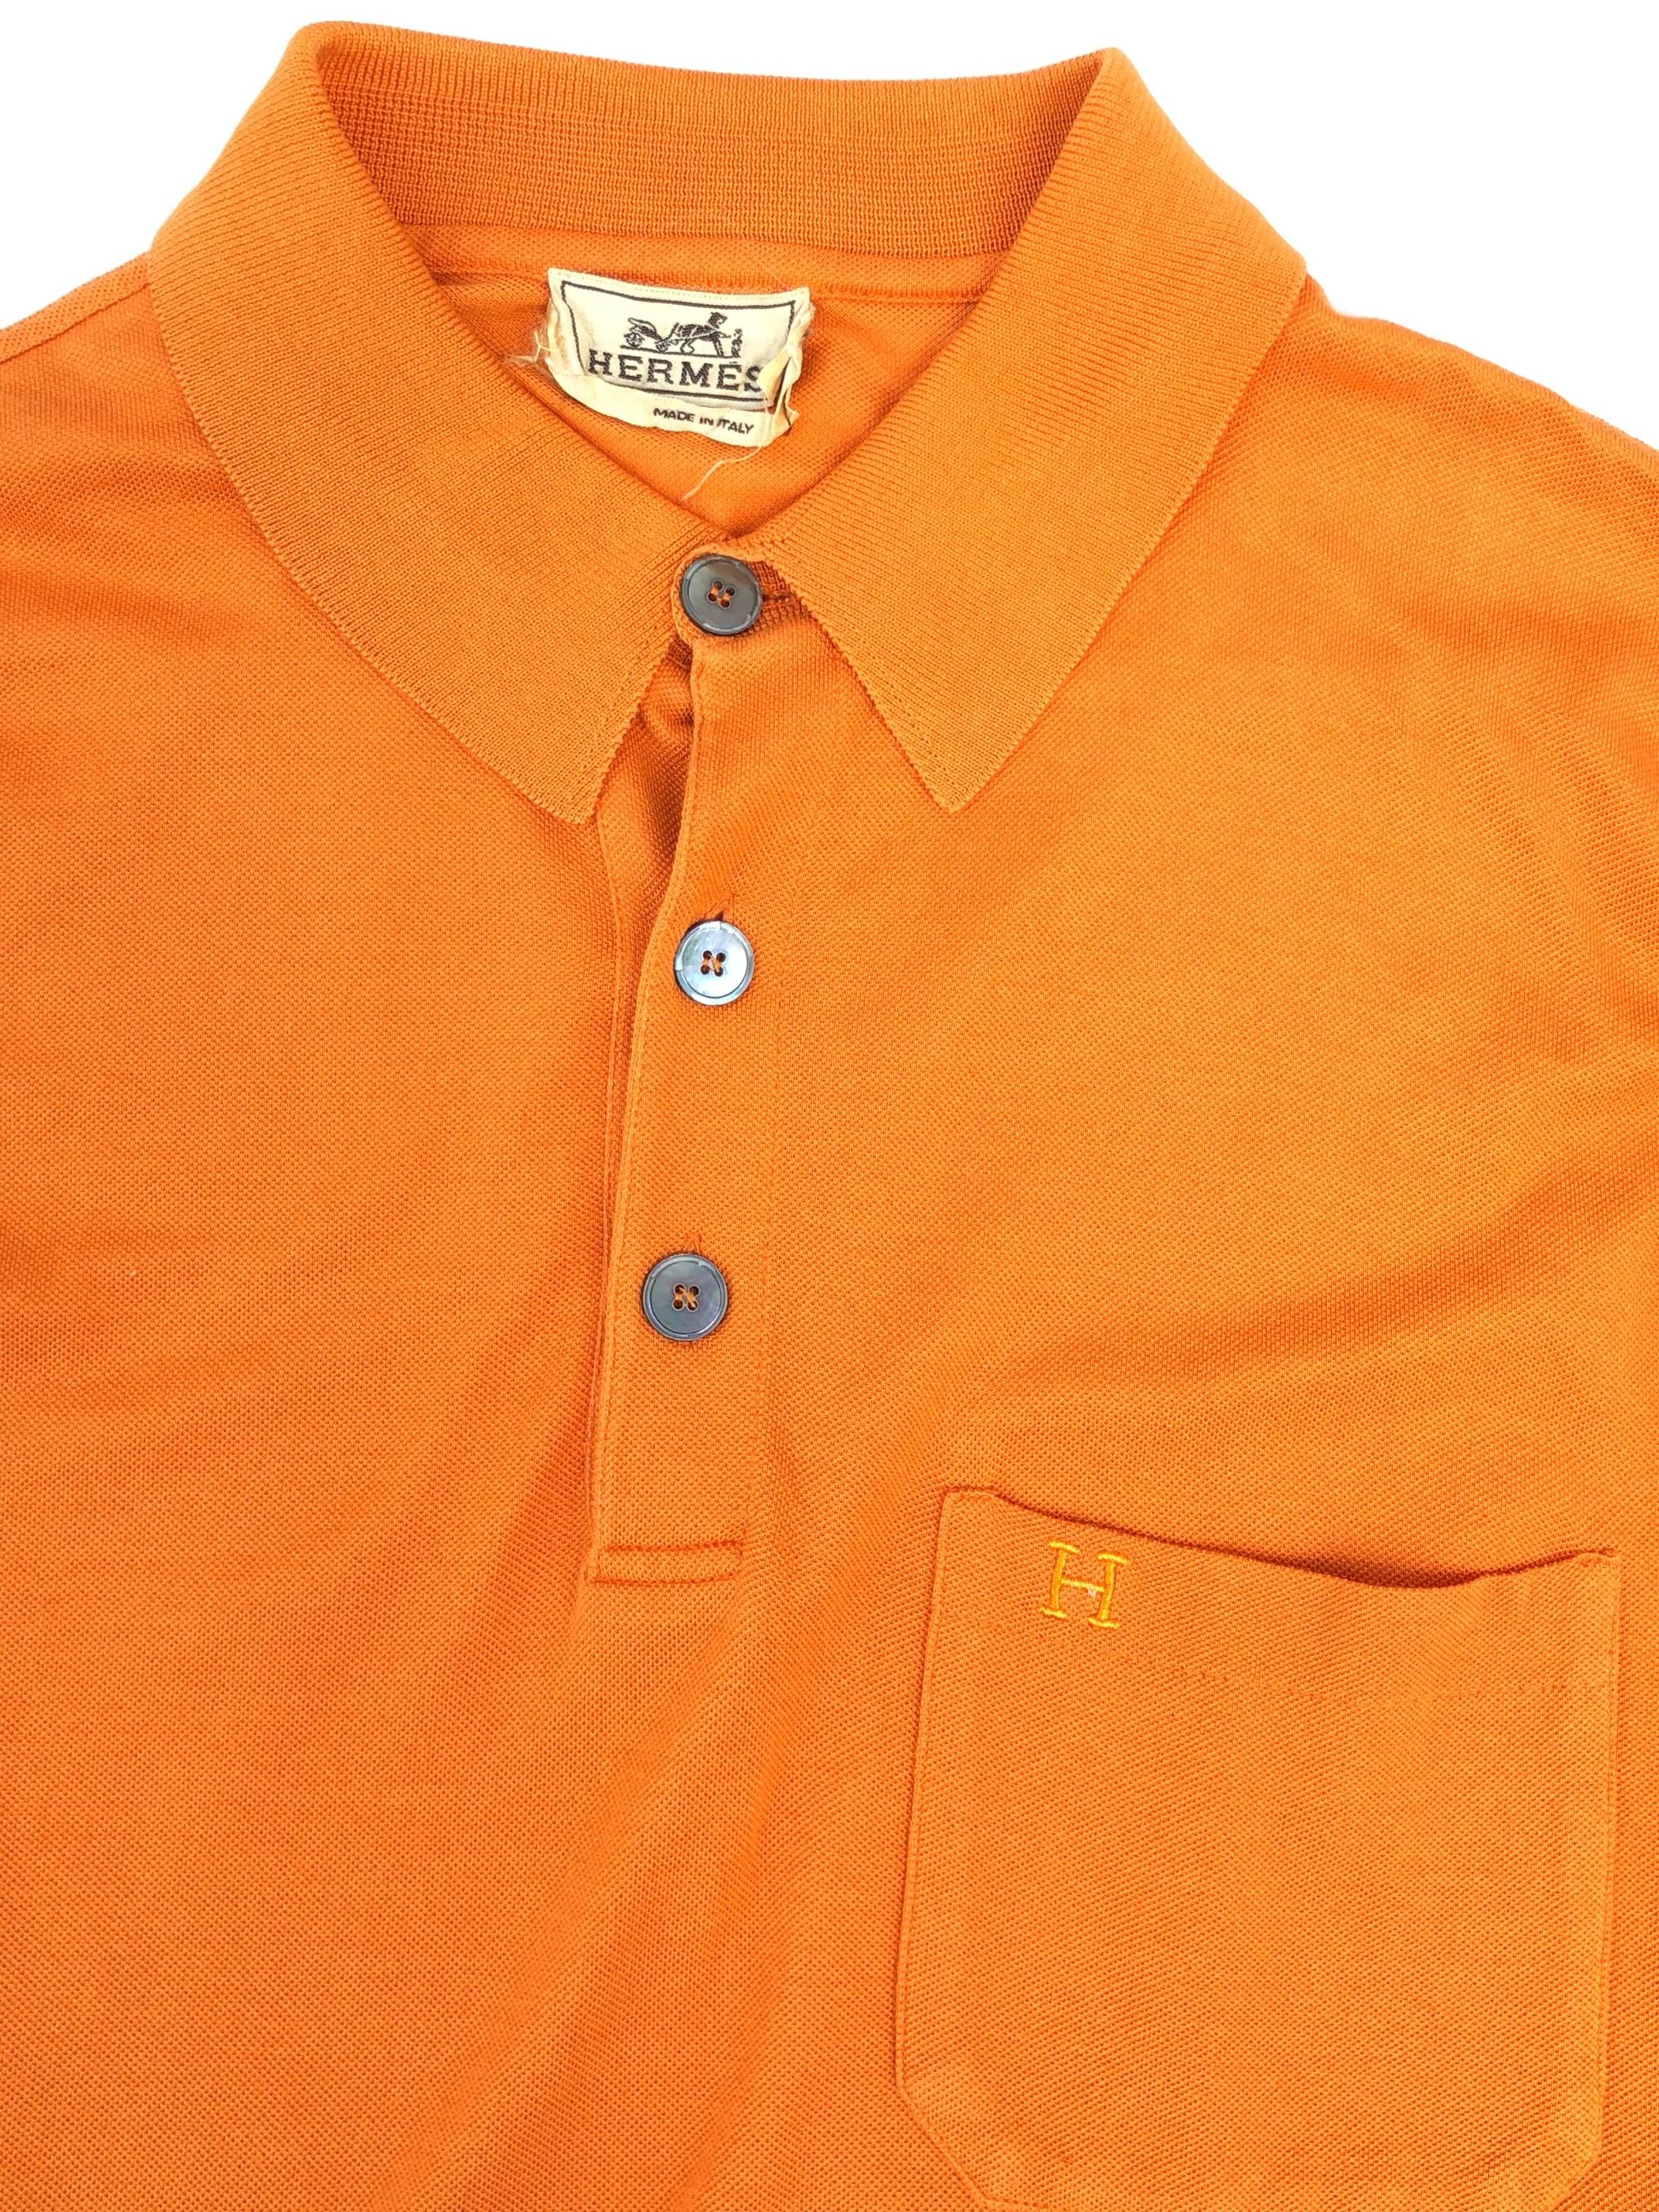 "HERMES / long sleeve polo shirt ""orange "" (USED)"